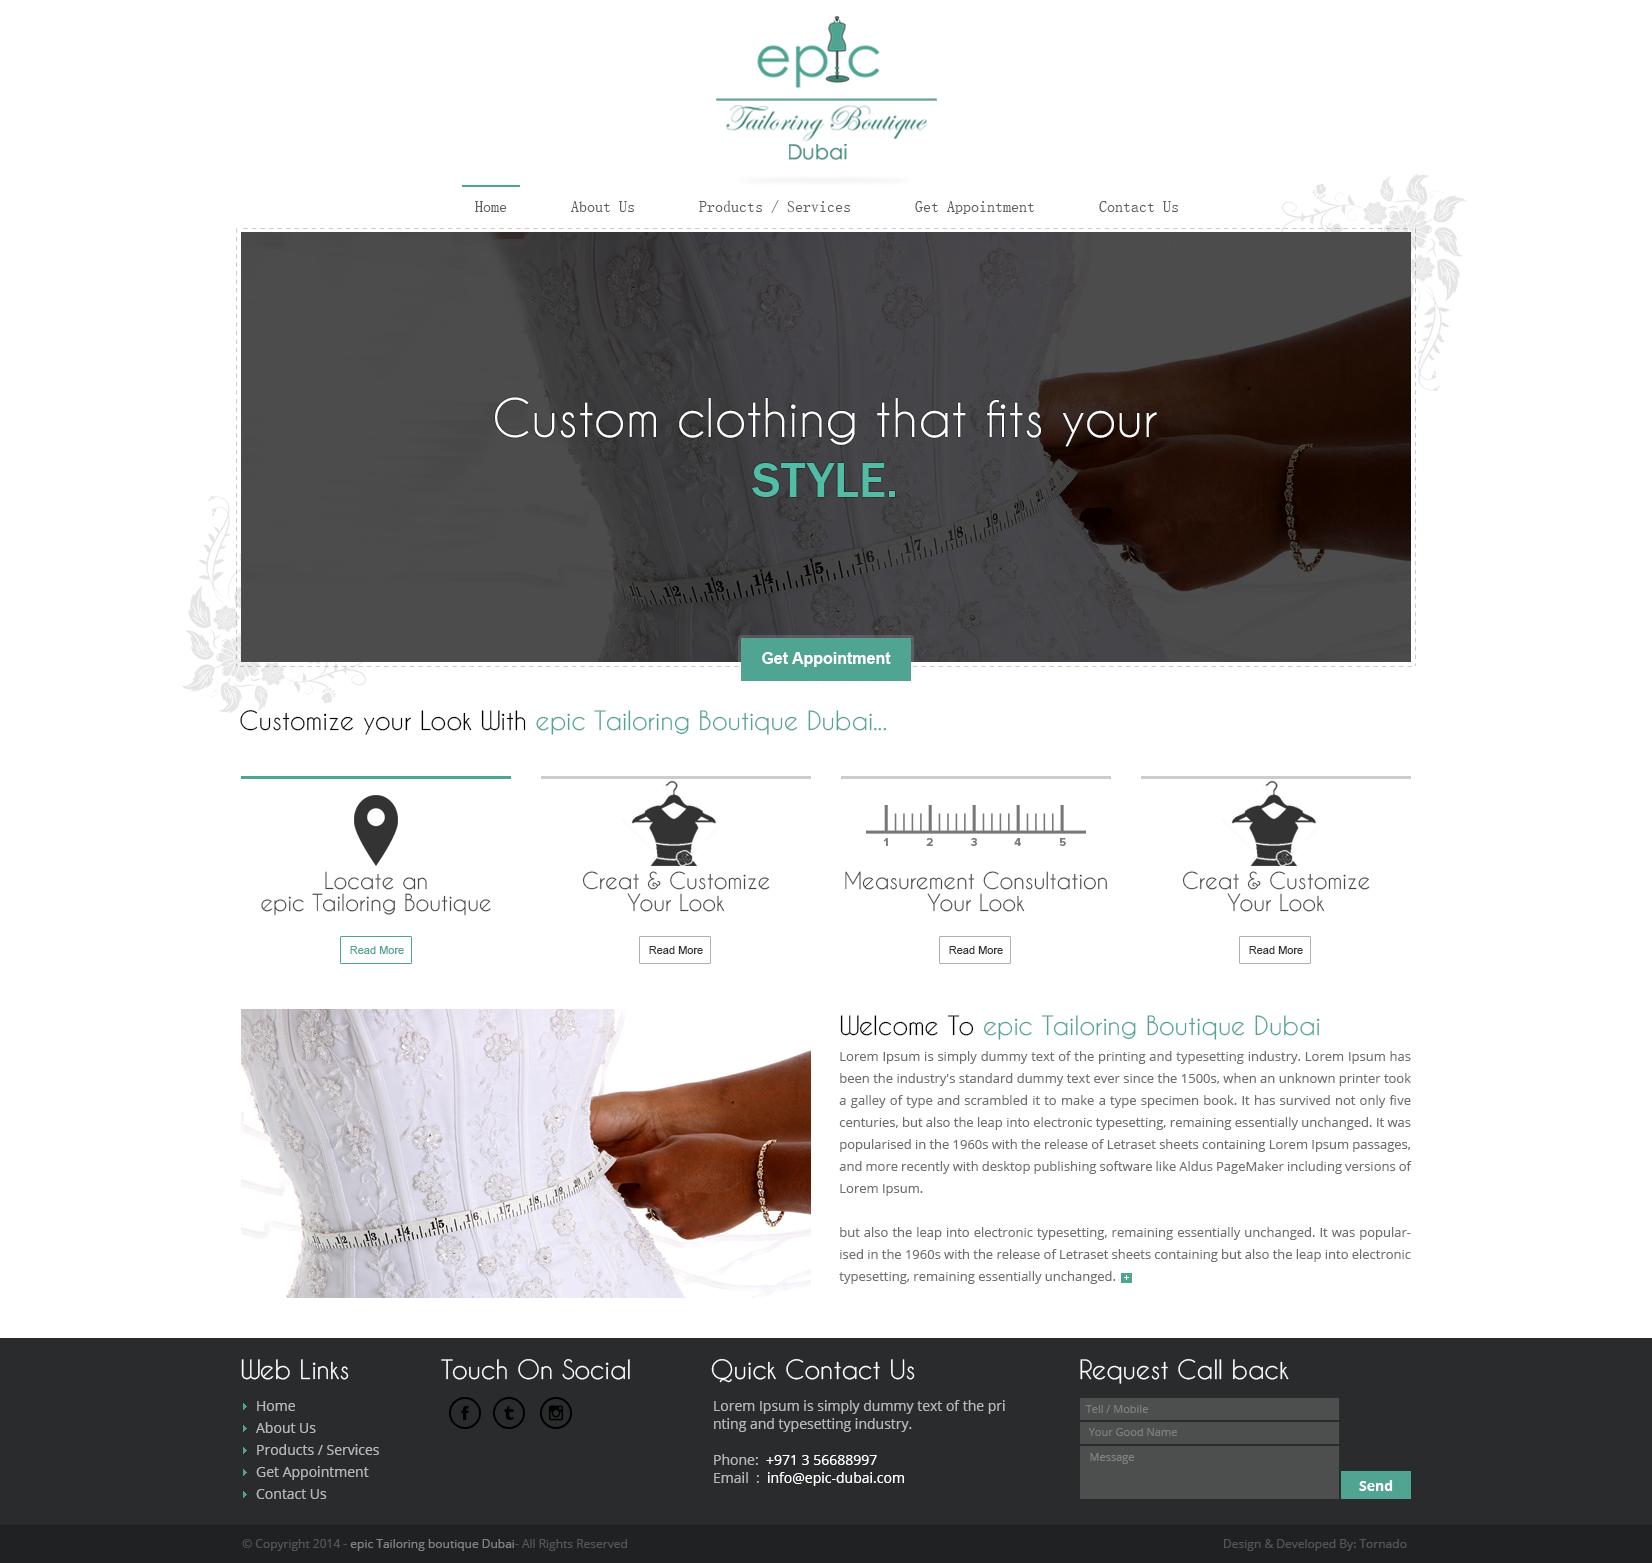 Epic tailoring boutique dubai